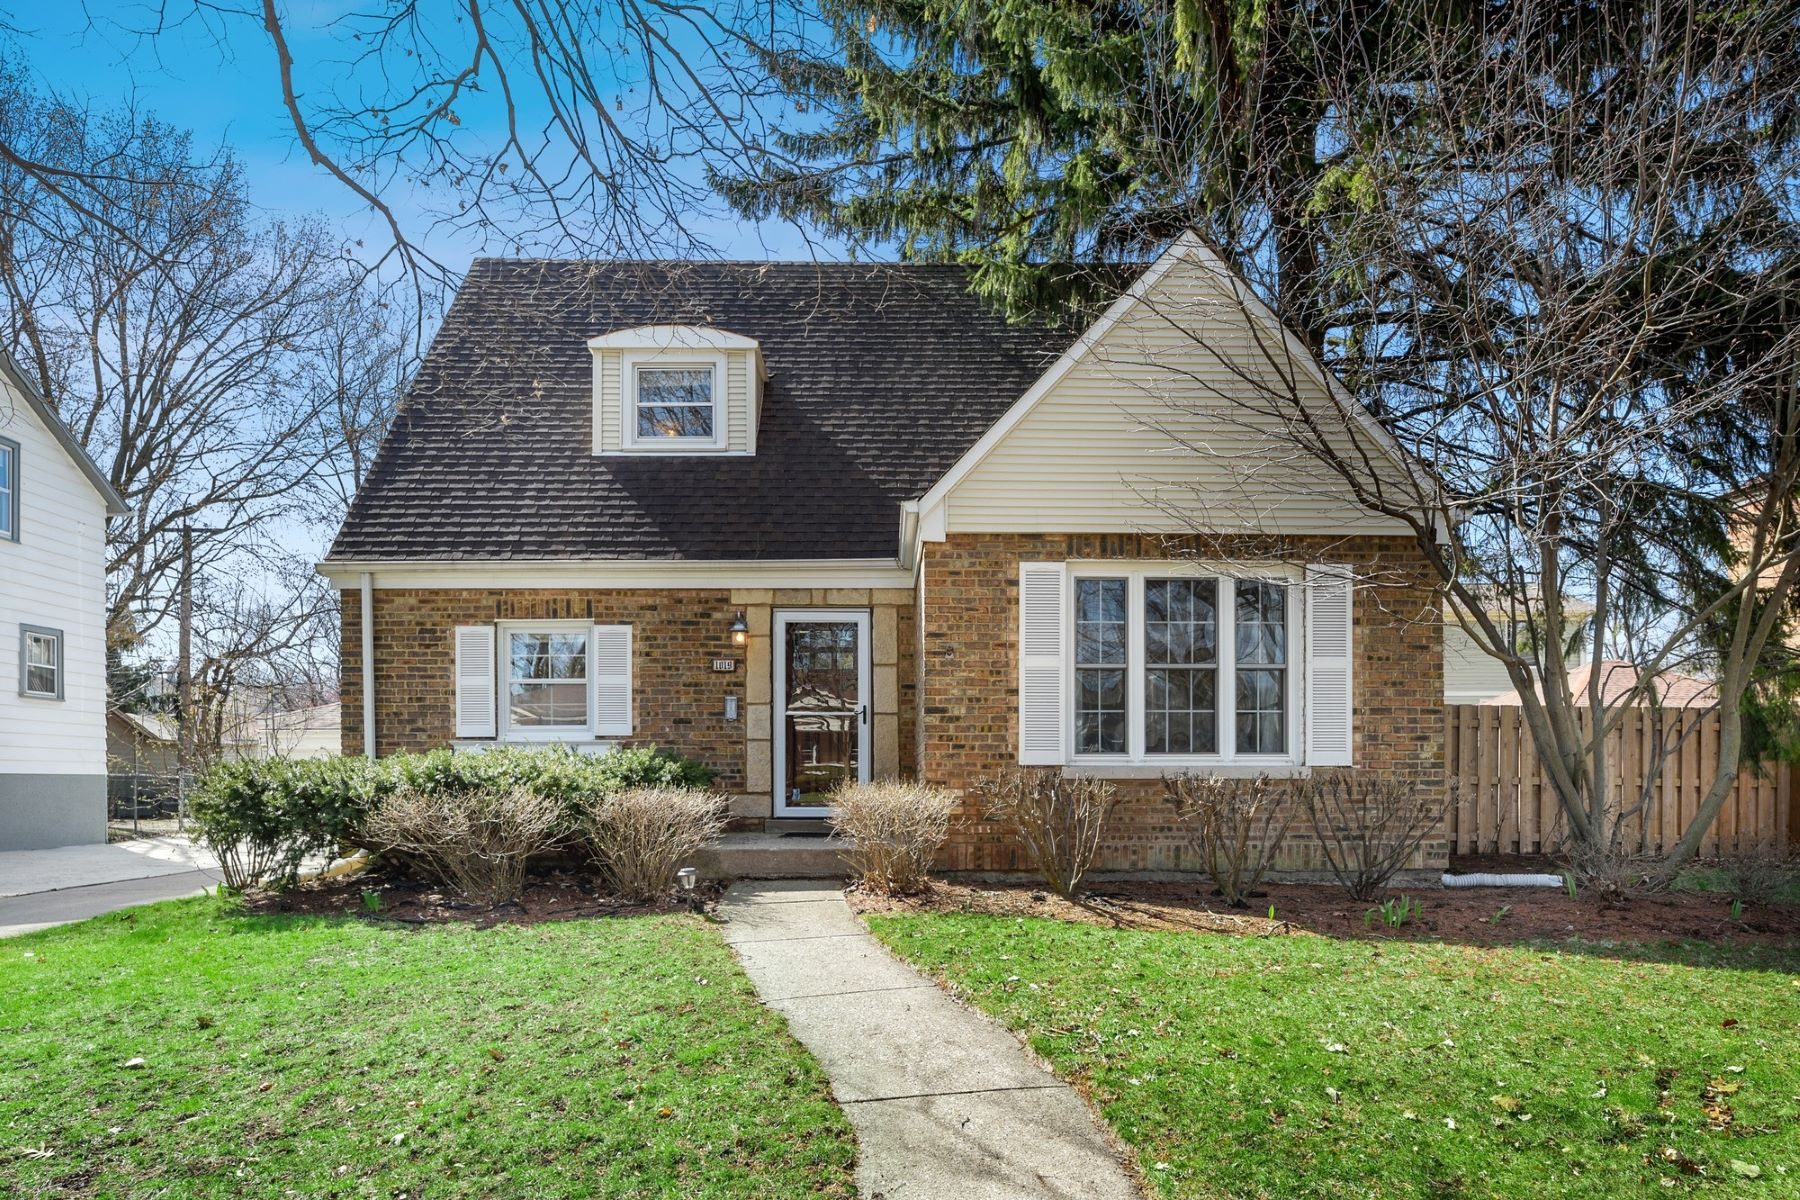 Single Family Homes για την Πώληση στο 1019 Division Street, Oak Park, IL 60302 Oak Park, Ιλινοϊσ 60302 Ηνωμένες Πολιτείες